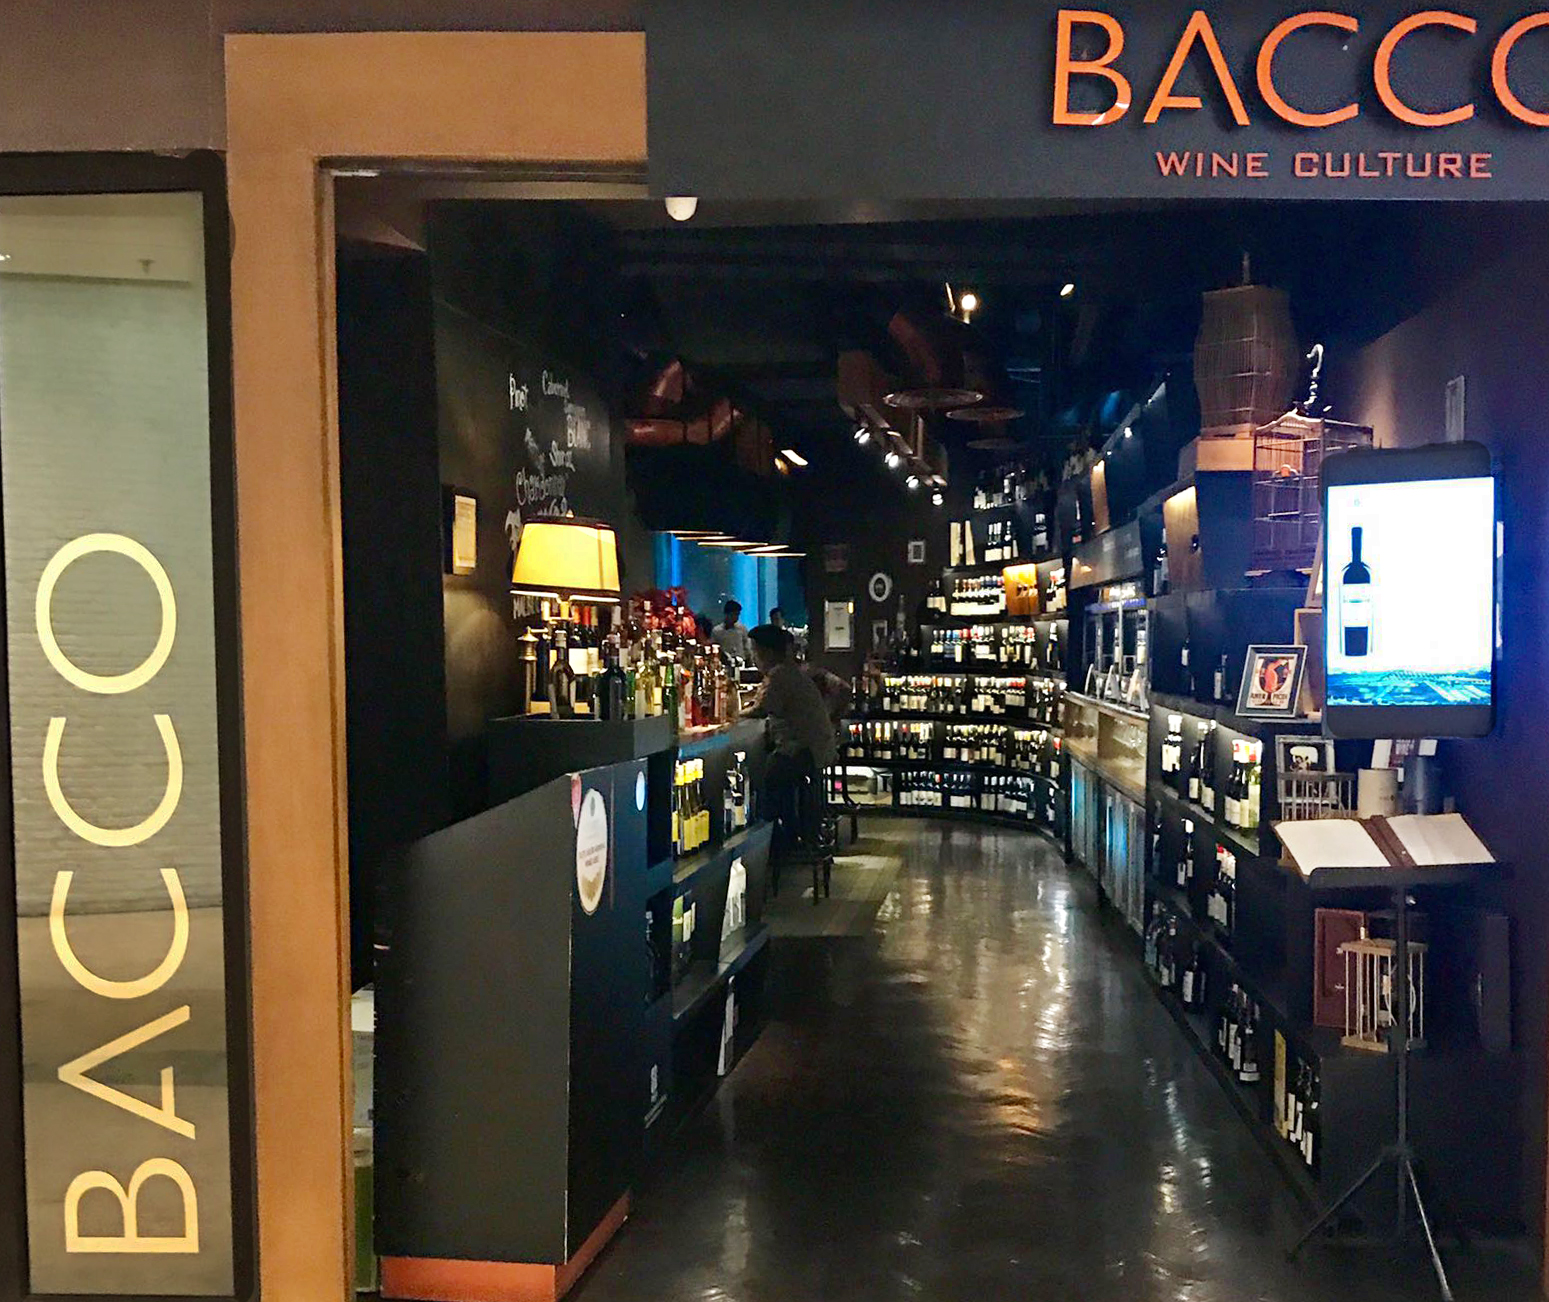 Bacco Wine Culture Jakarta in Kuningan